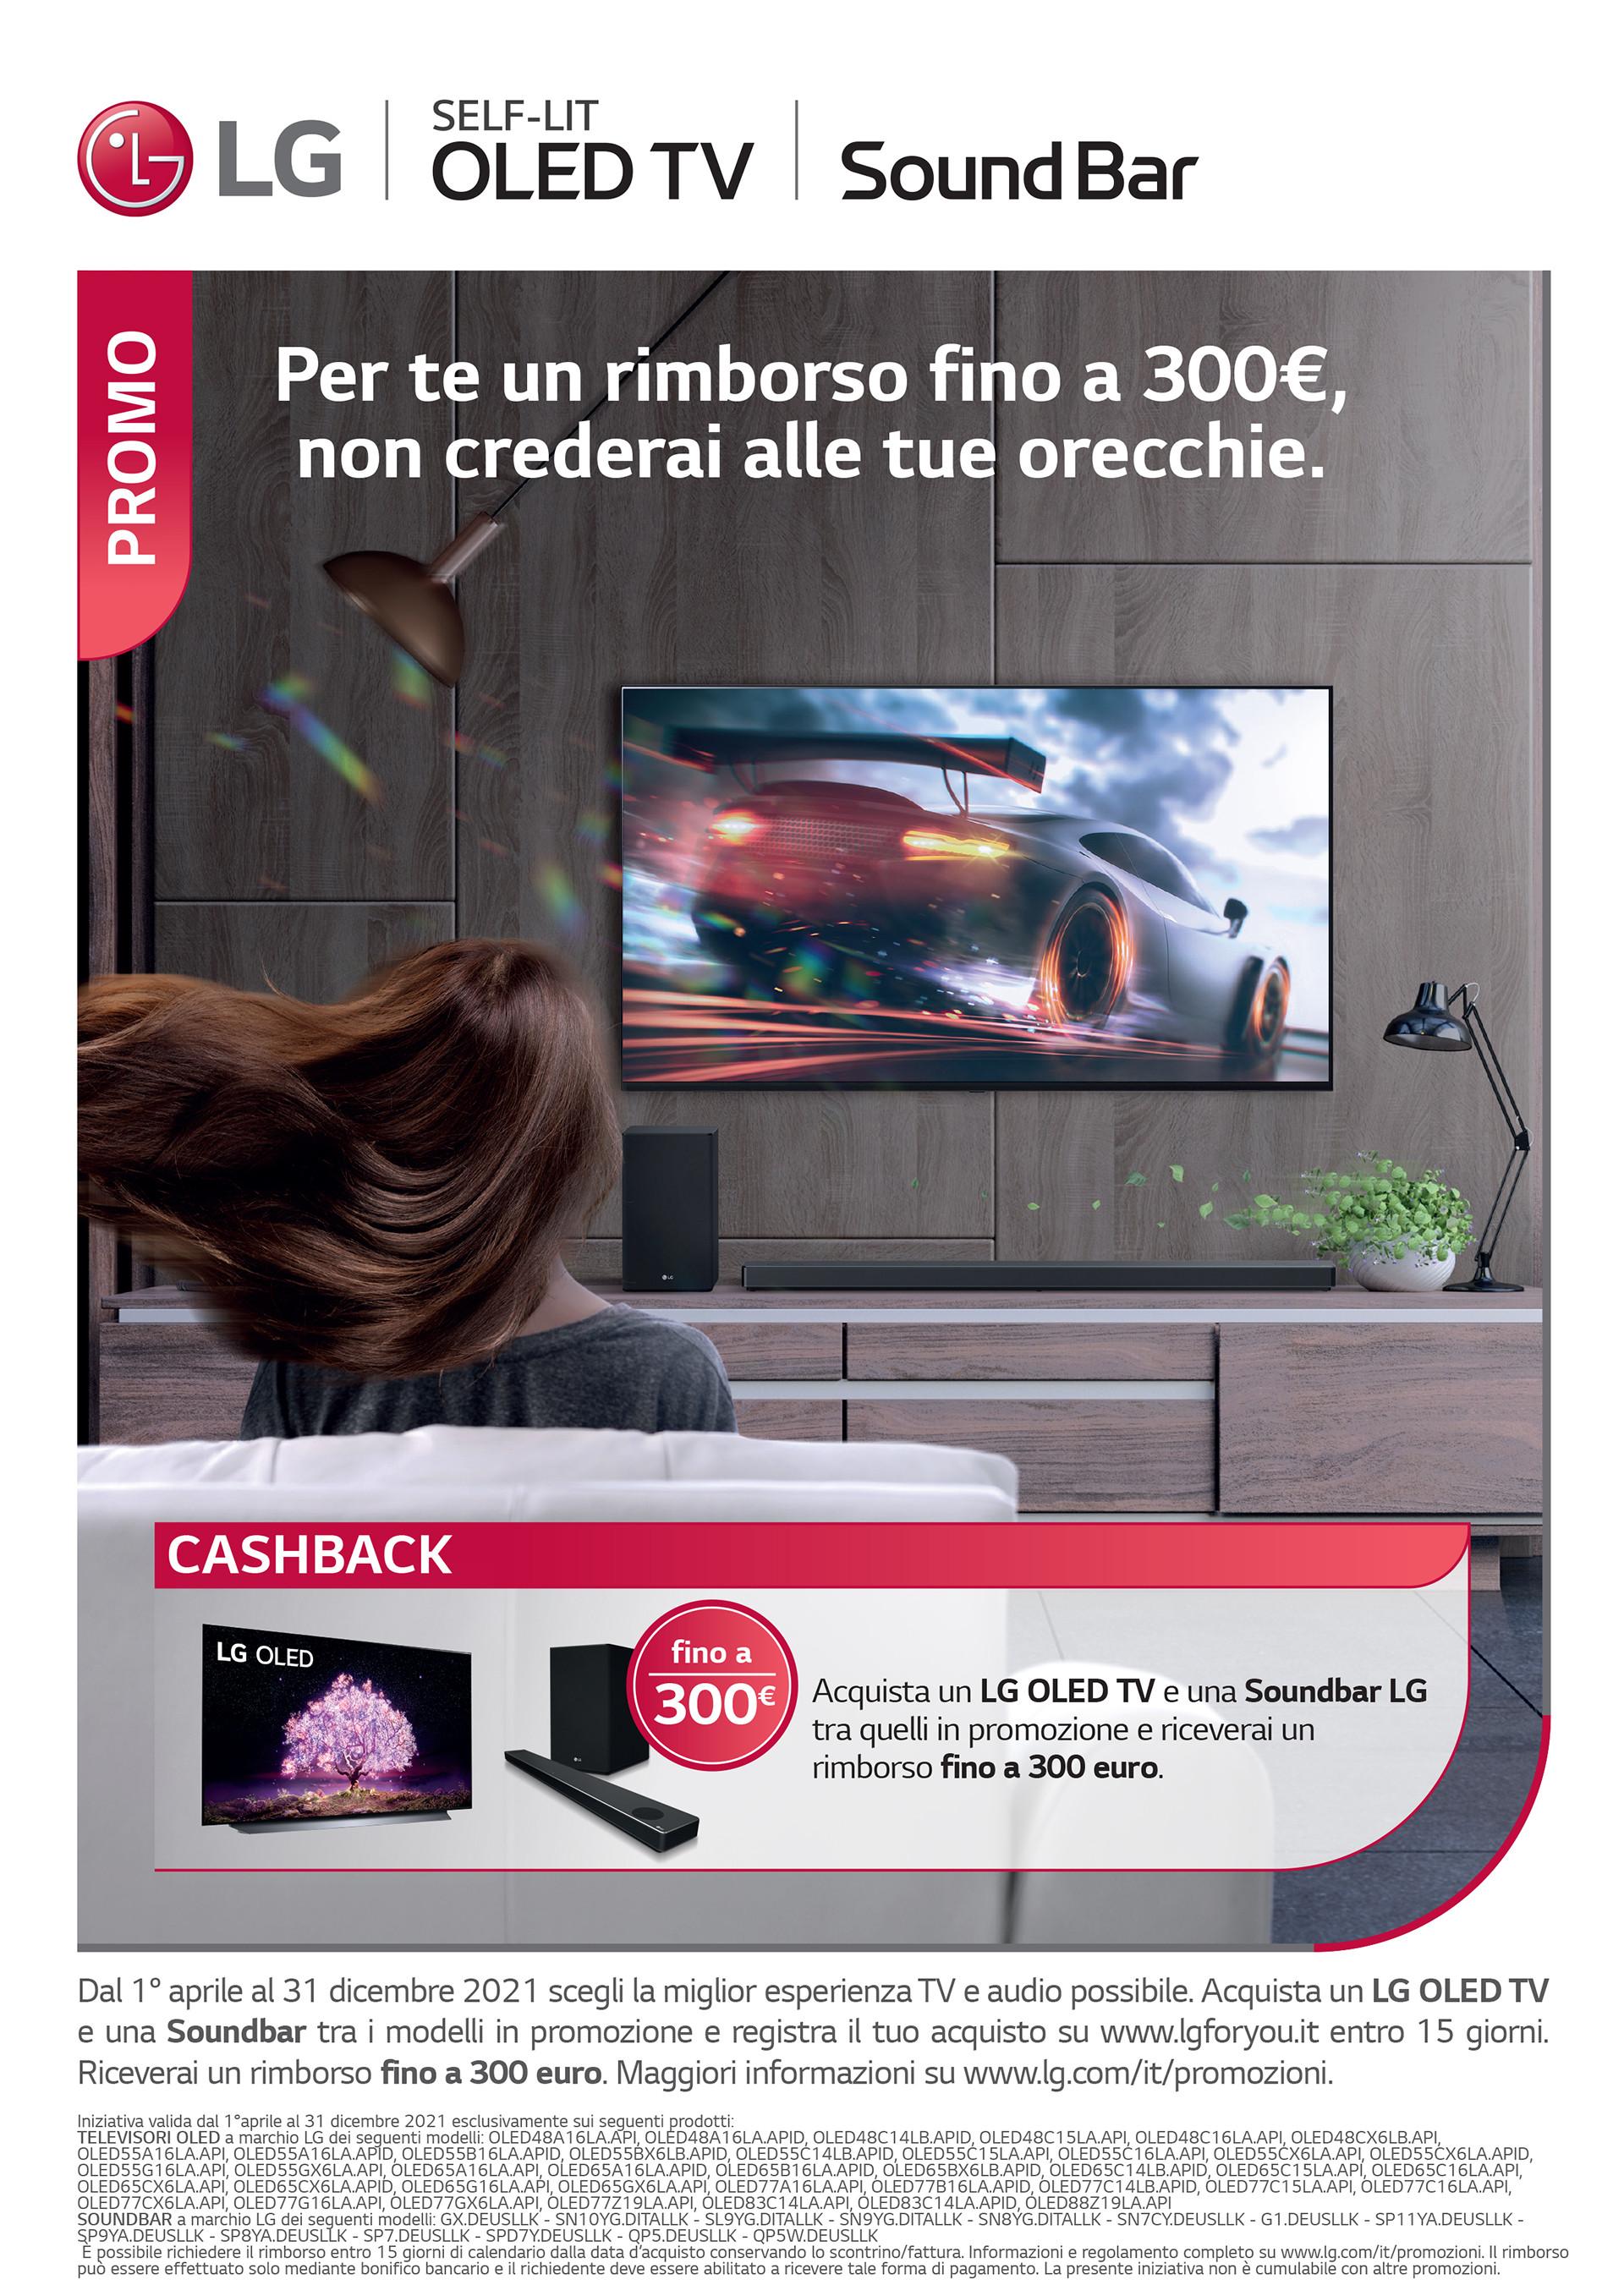 Lg_A4_PROMO_TV OLED_SOUNDBAR CASH BACK.jpg